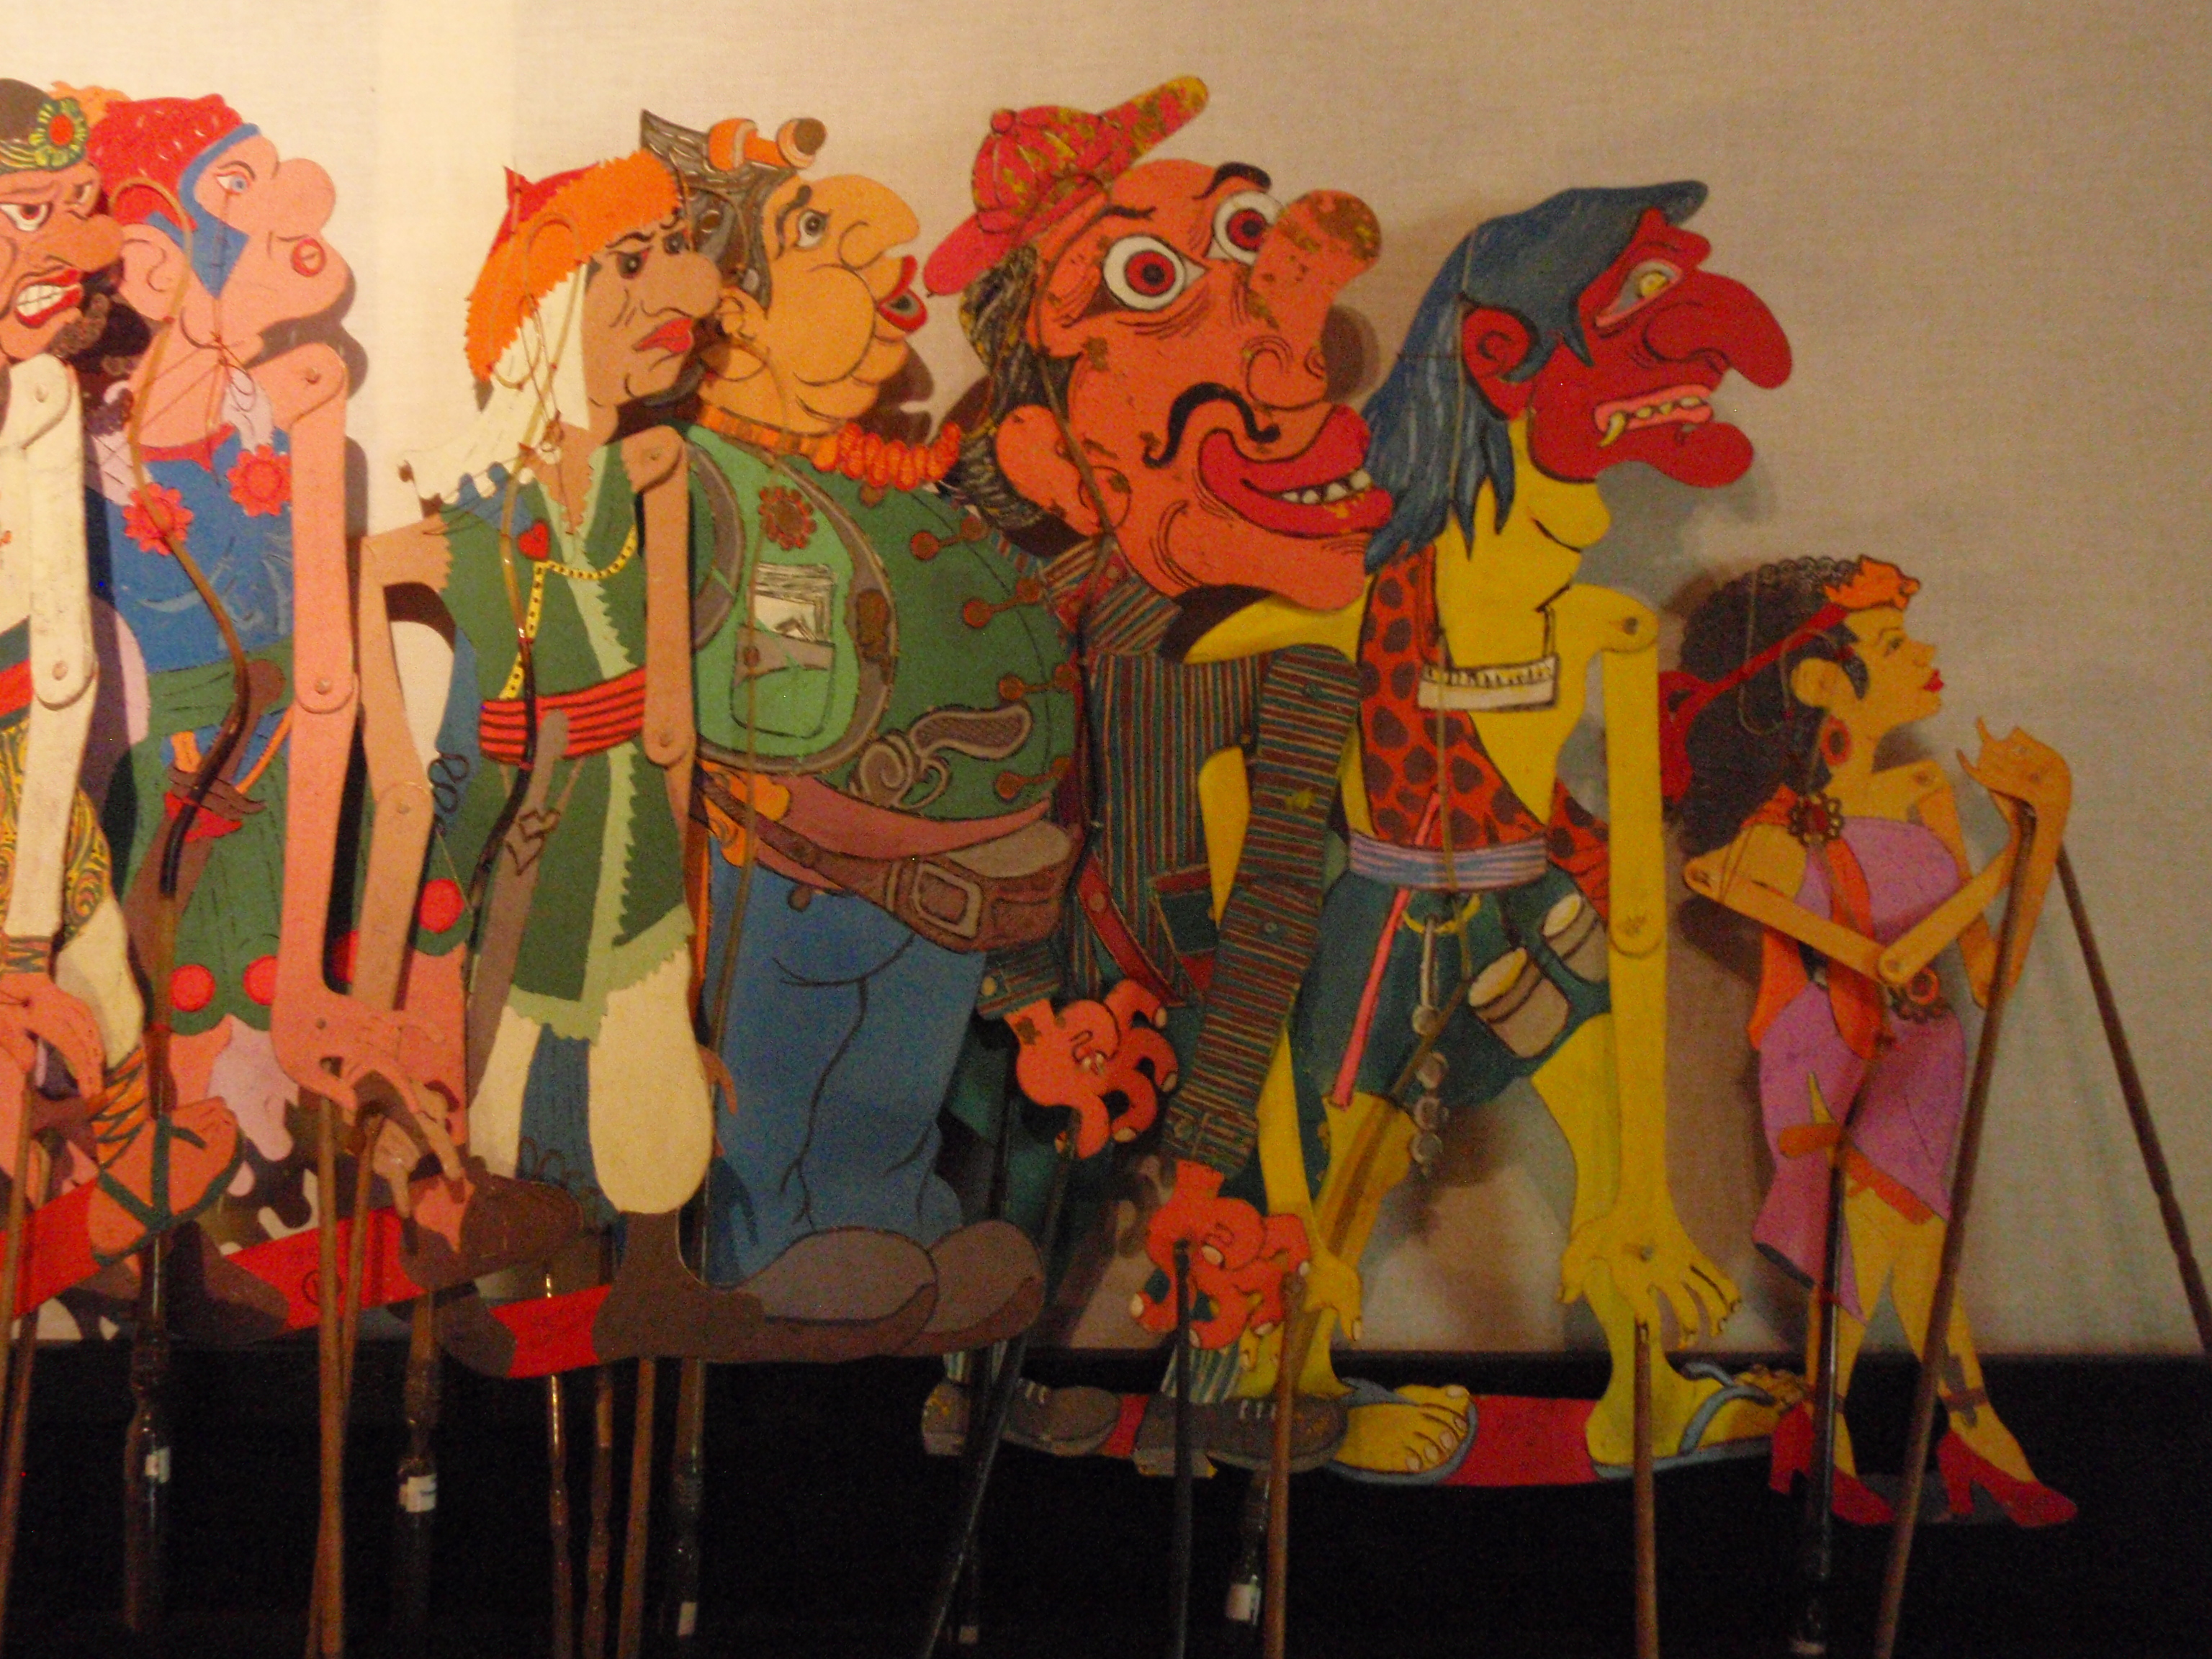 <em>Wayang kartun</em> (bande dessinée), des marionnettes d'ombres en cuir représentant des personnages de bandes dessinées ou de personnages fantastiques d'histoires populaires modernes. Collection : Setia Darma House of Masks and Puppets, Gianyar, Bali, Indonésie.